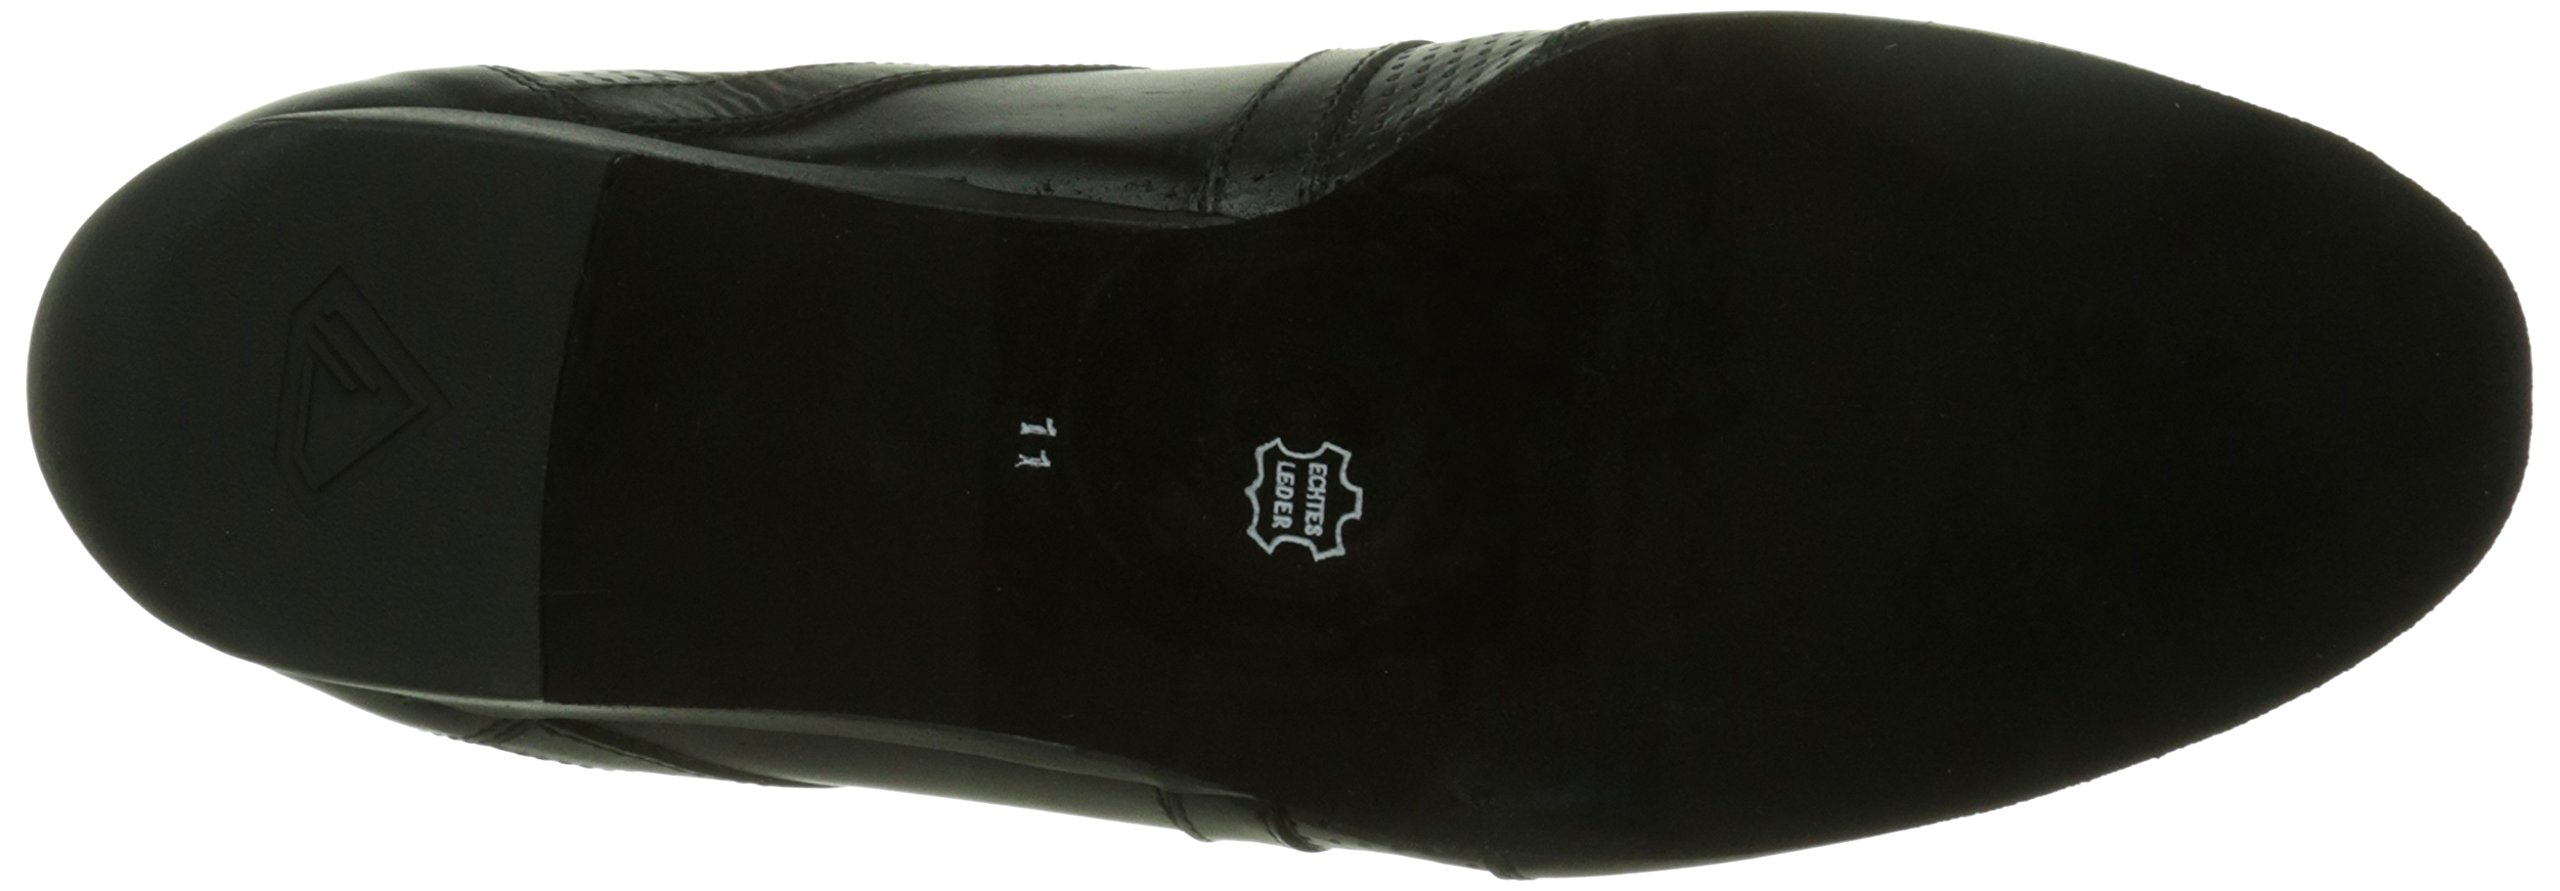 Diamant Men's Model 13 Dance Sneaker- 1'' (2.5 cm) Wedge Heel (Wide - H Width), 13.5 W US (13 UK) by Diamant (Image #3)